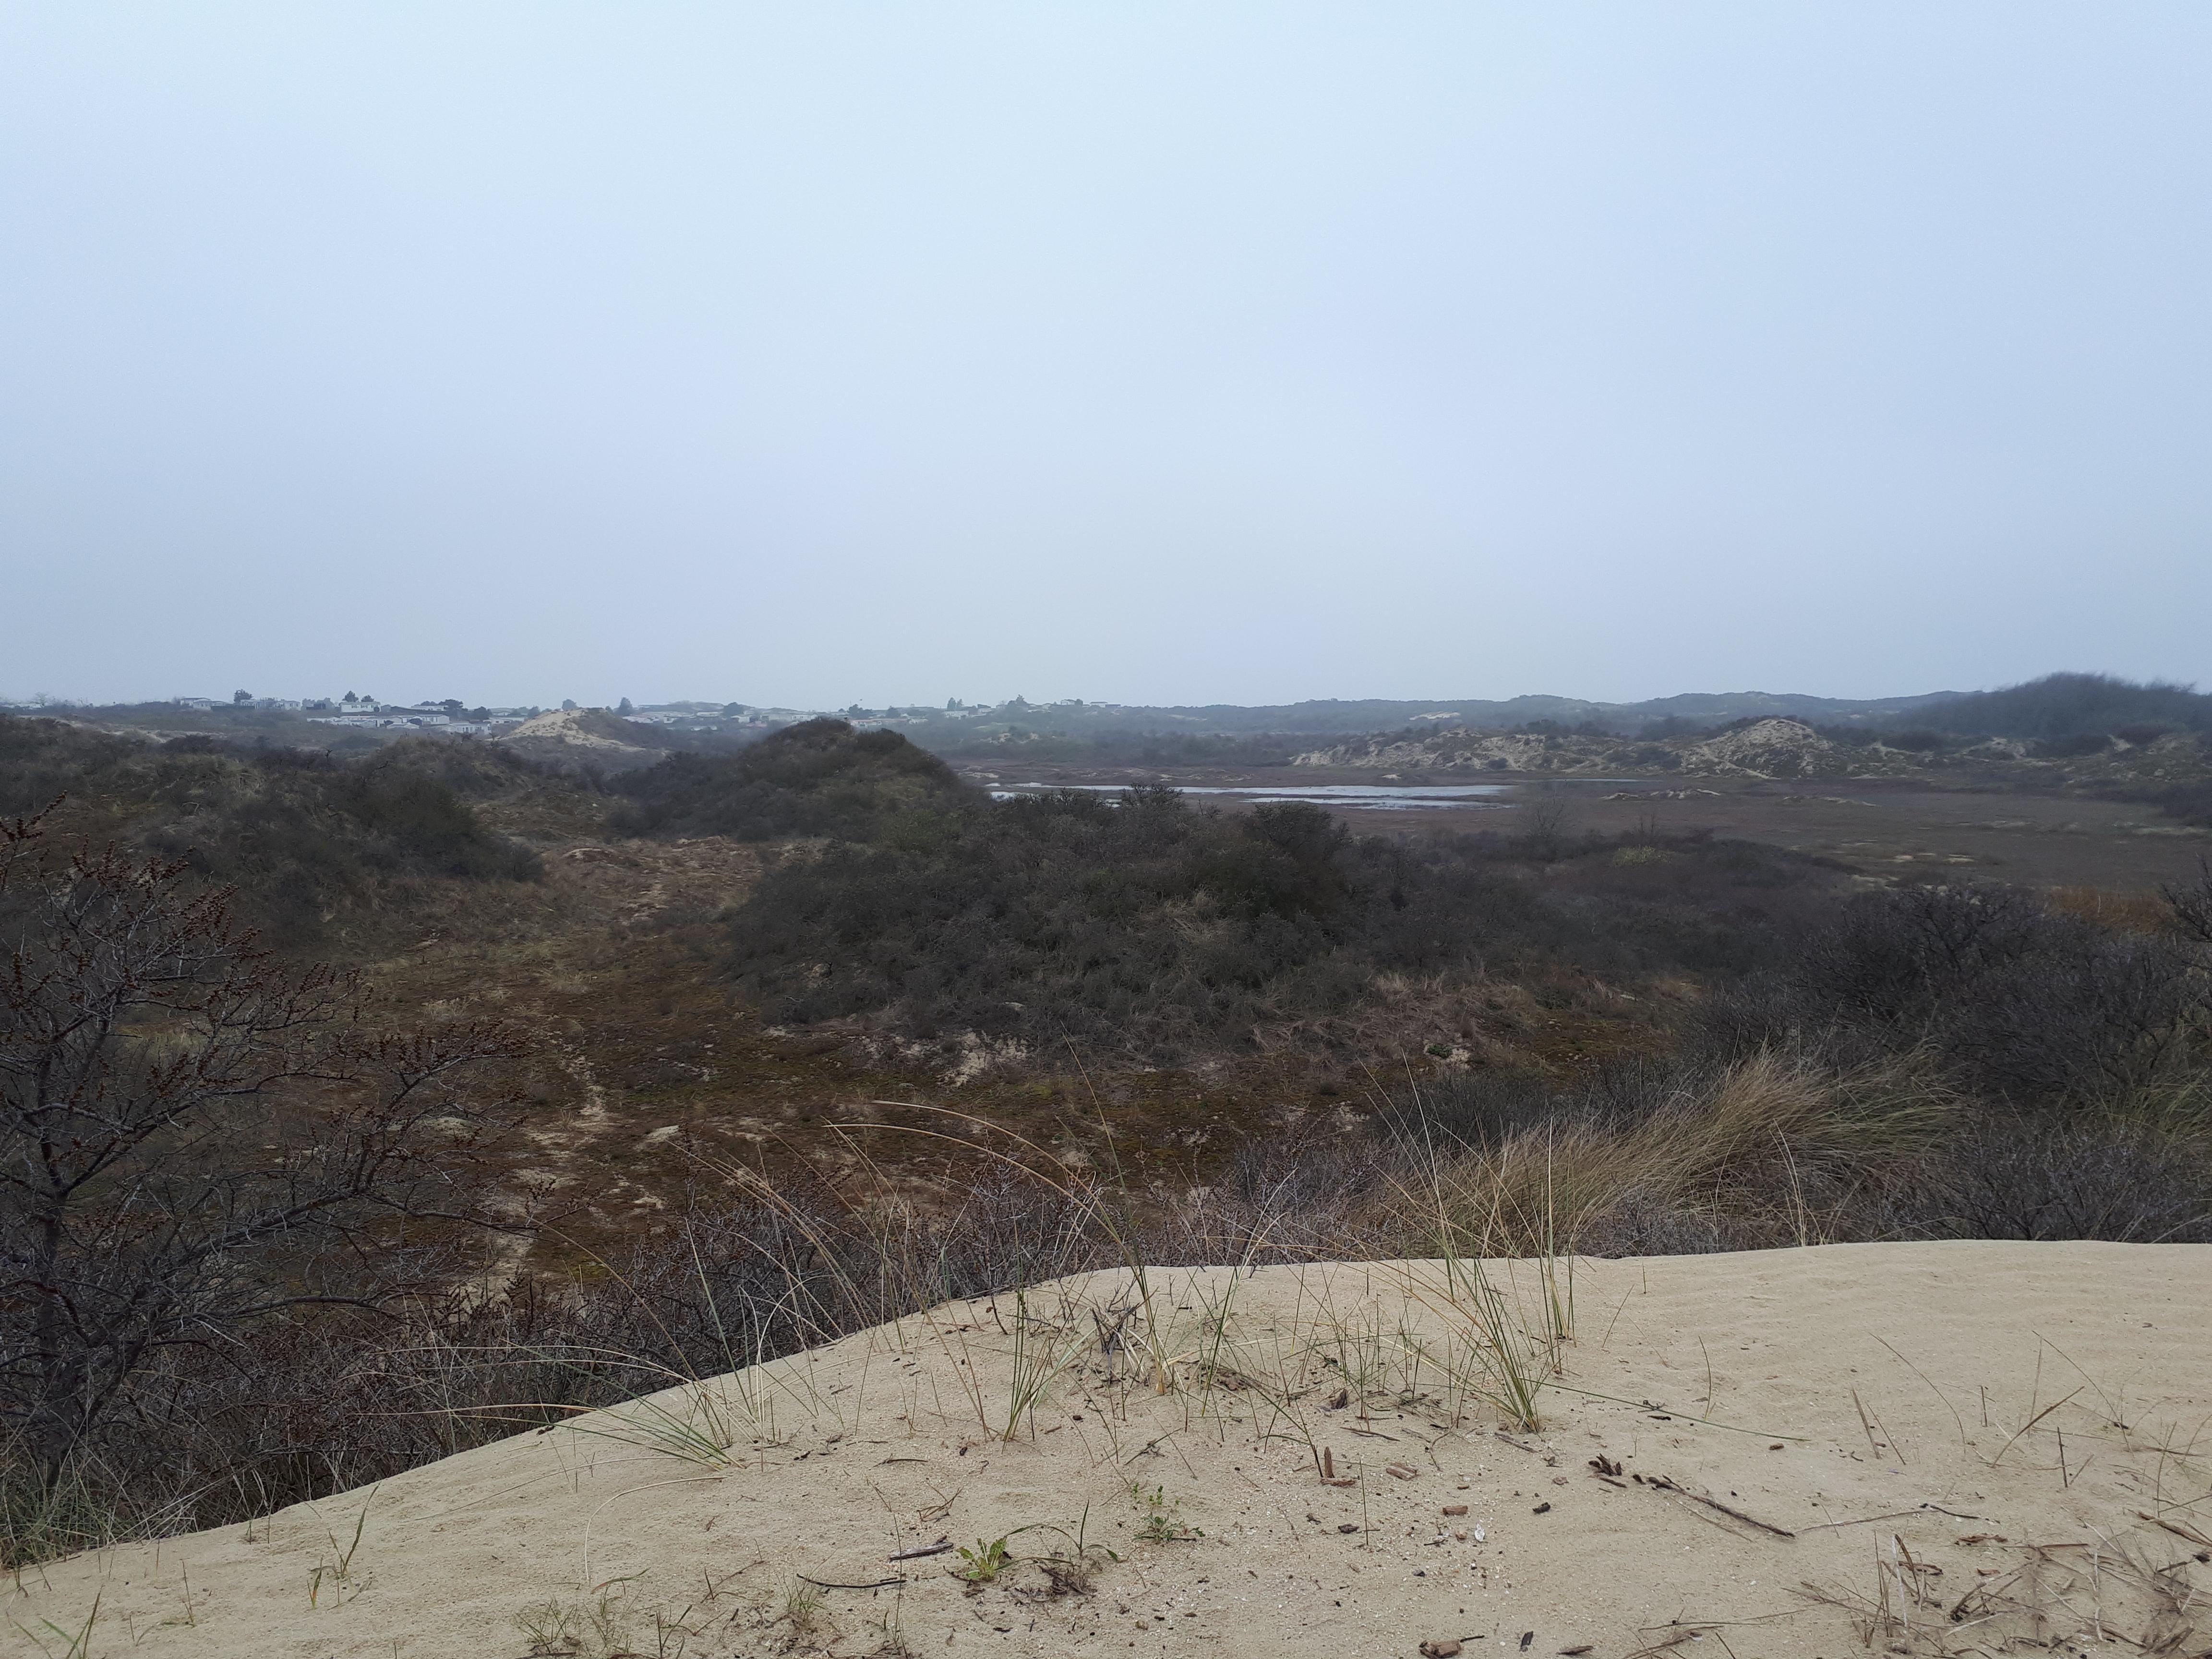 Geocaching - Zandbak reeks De Panne